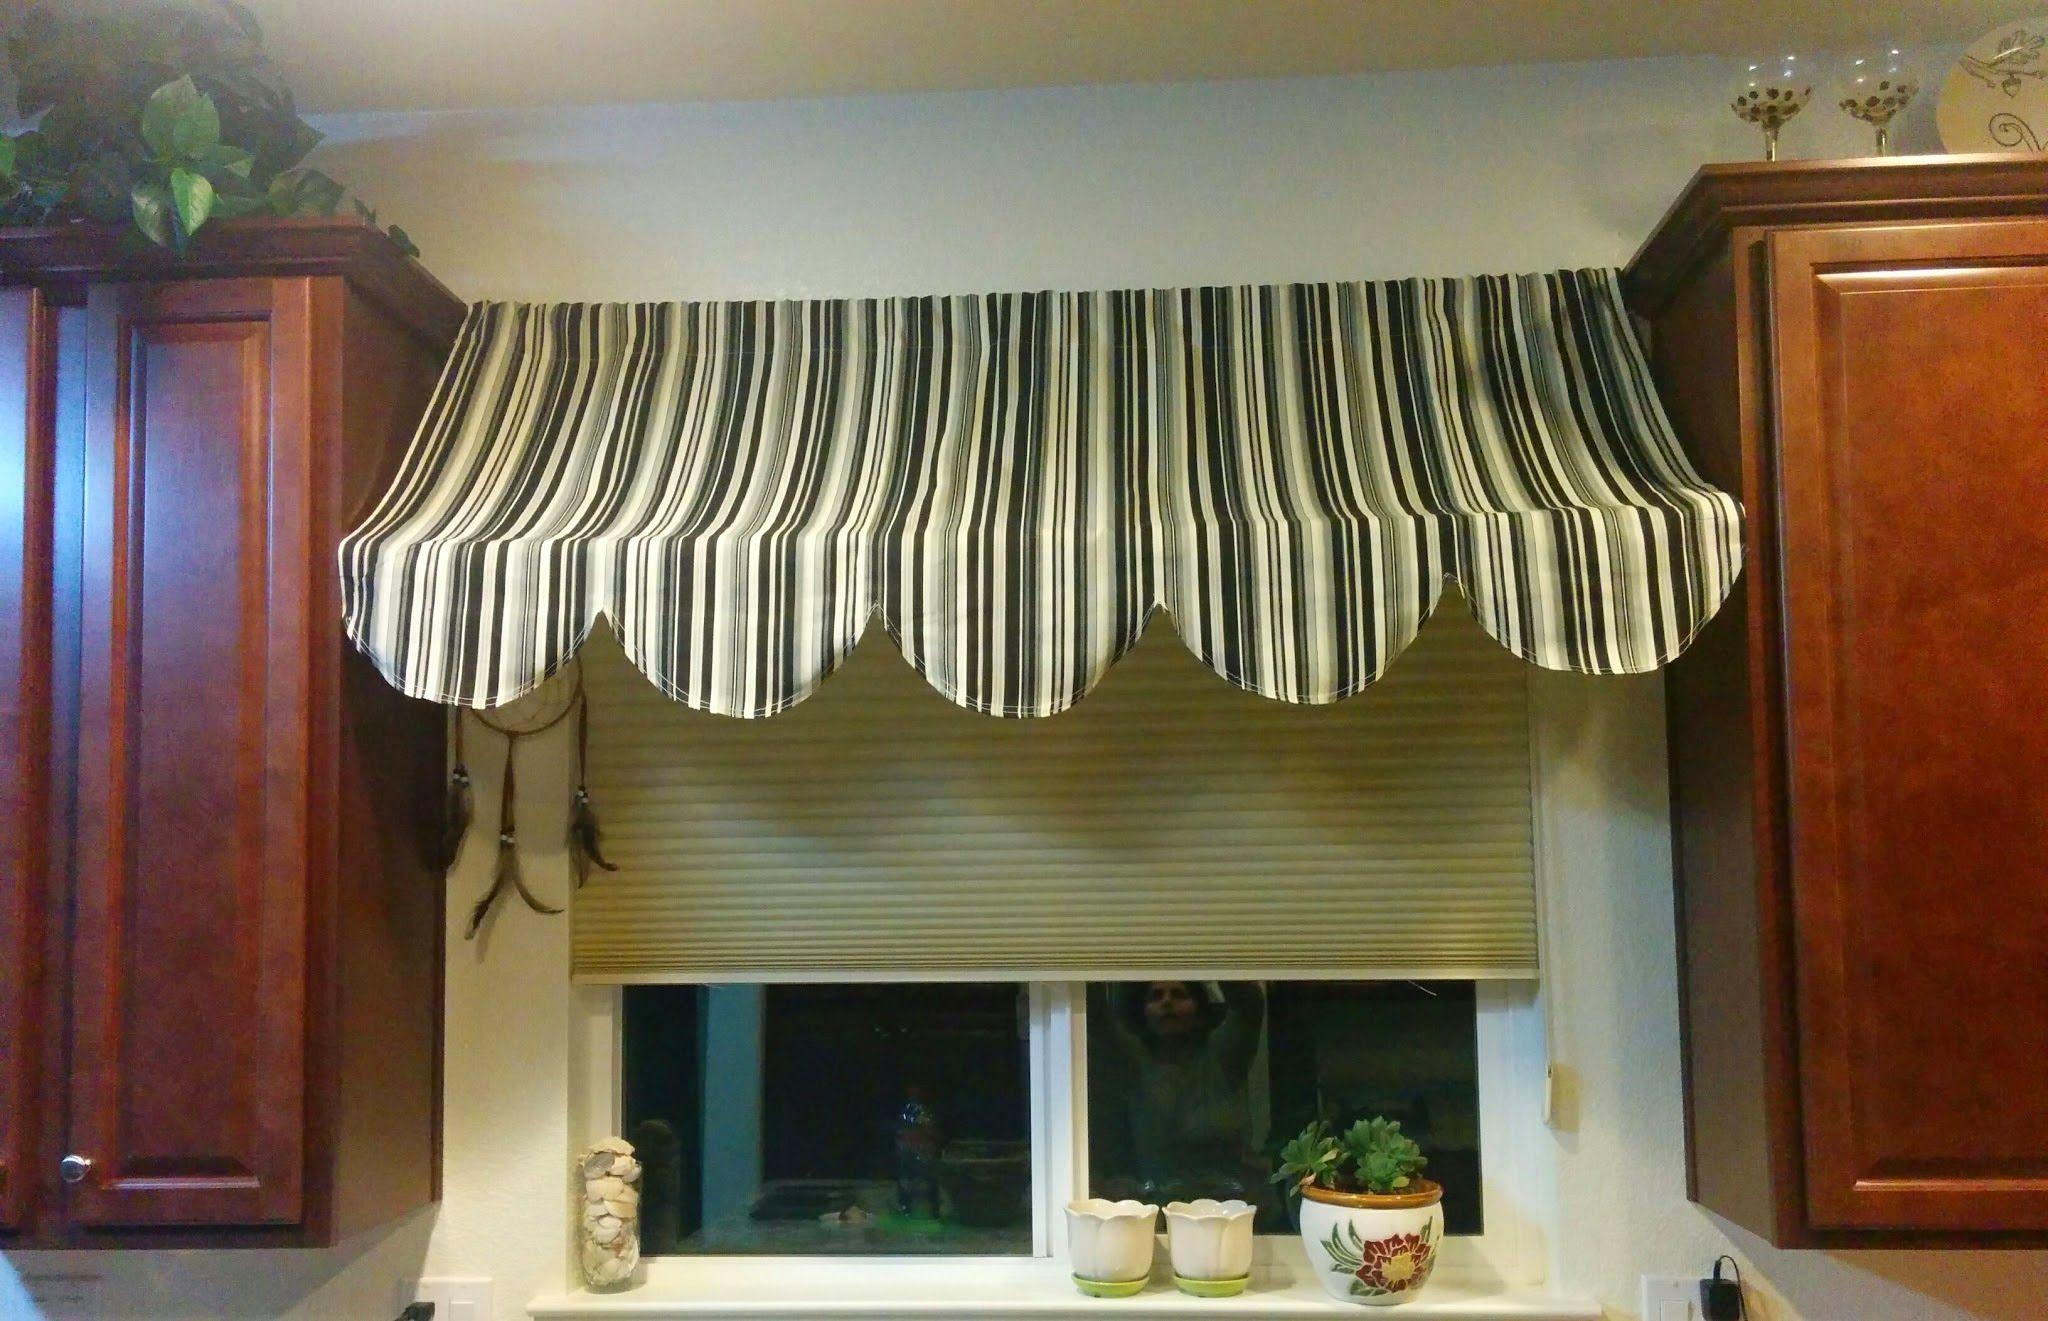 Easy Indoor Awning Home Ideas Bistro Kitchen Farmhouse Decor Valances